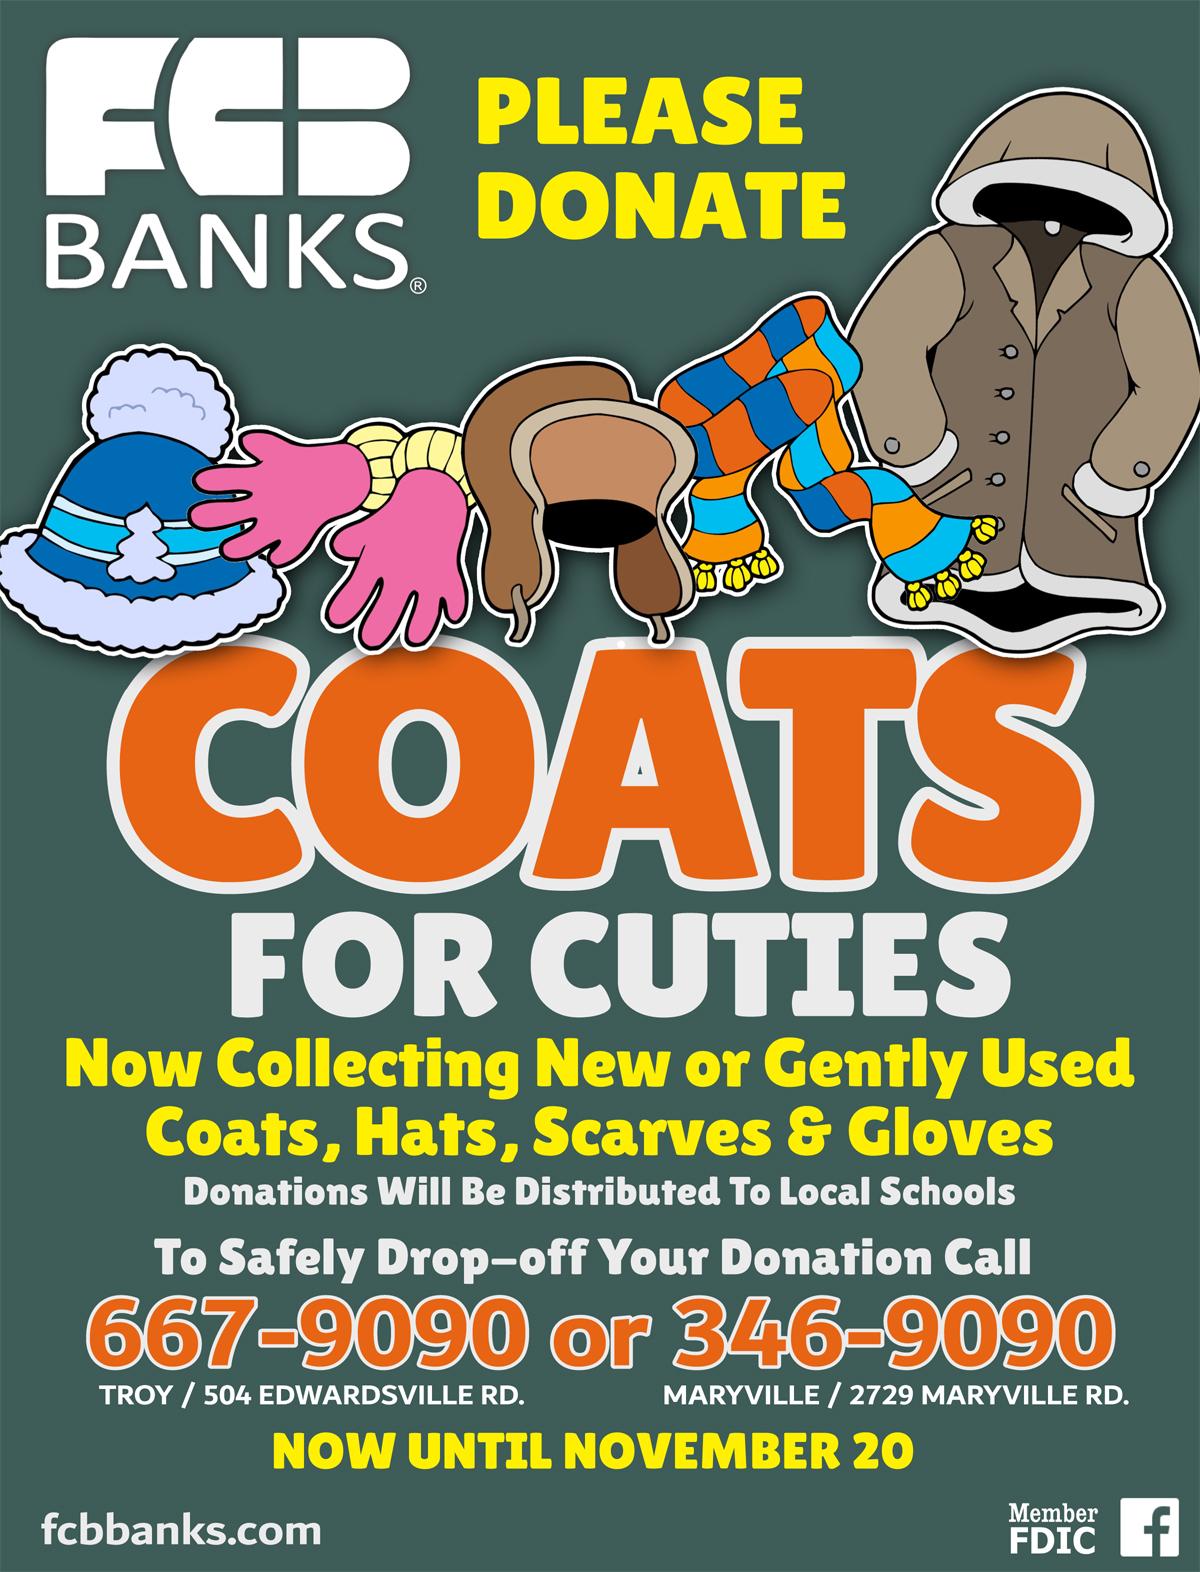 Coats for Cuties Donations at FCB Banks